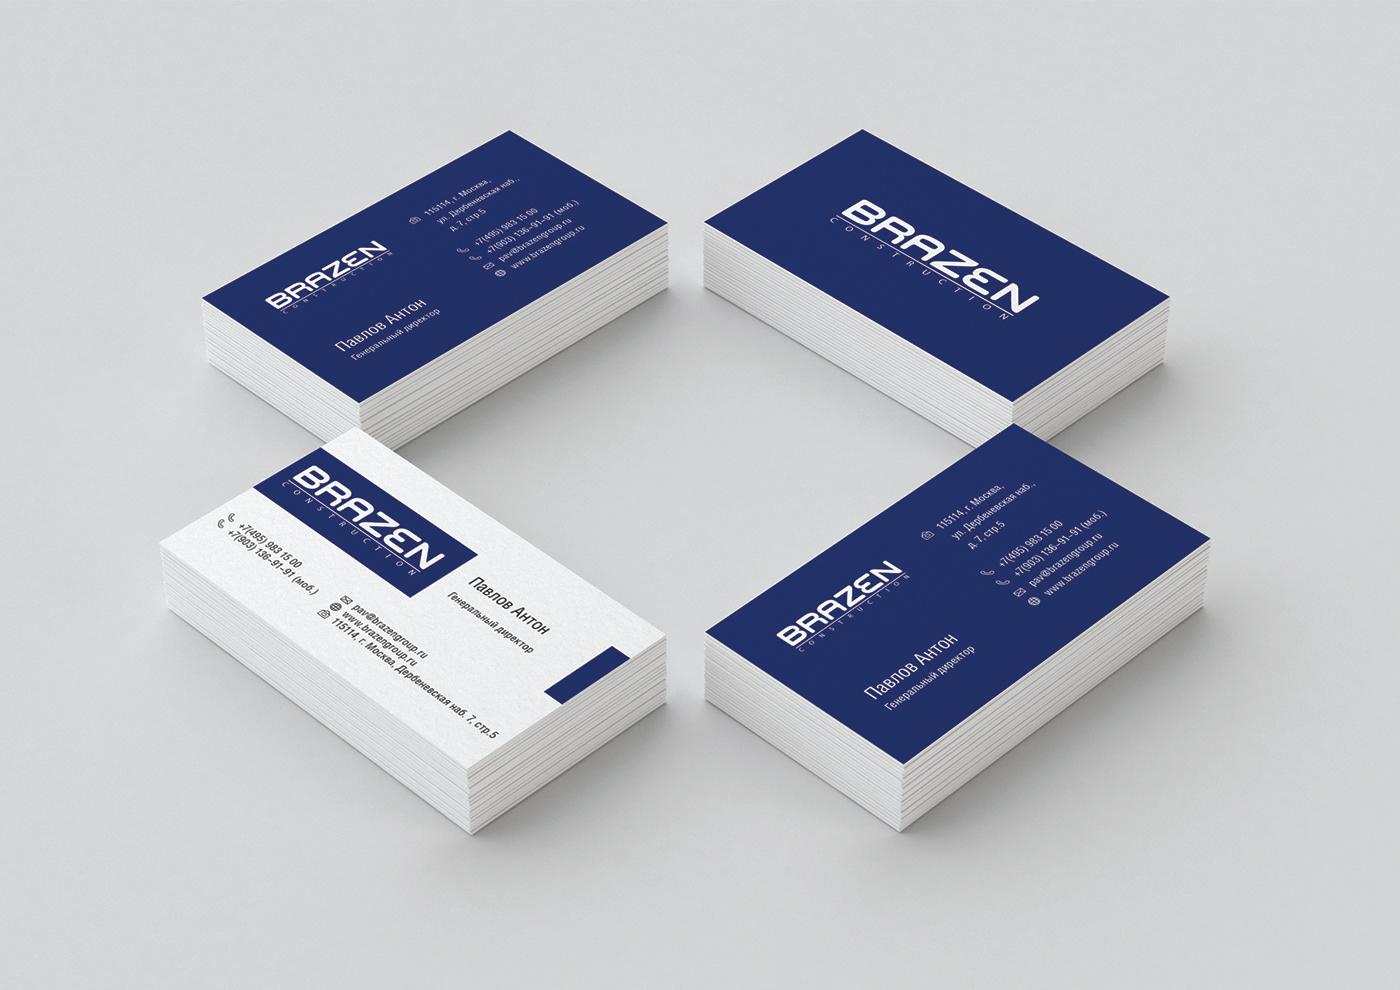 гайдлайн guideline brandbook branding  Logotype Logo Design логотип фирменный стиль